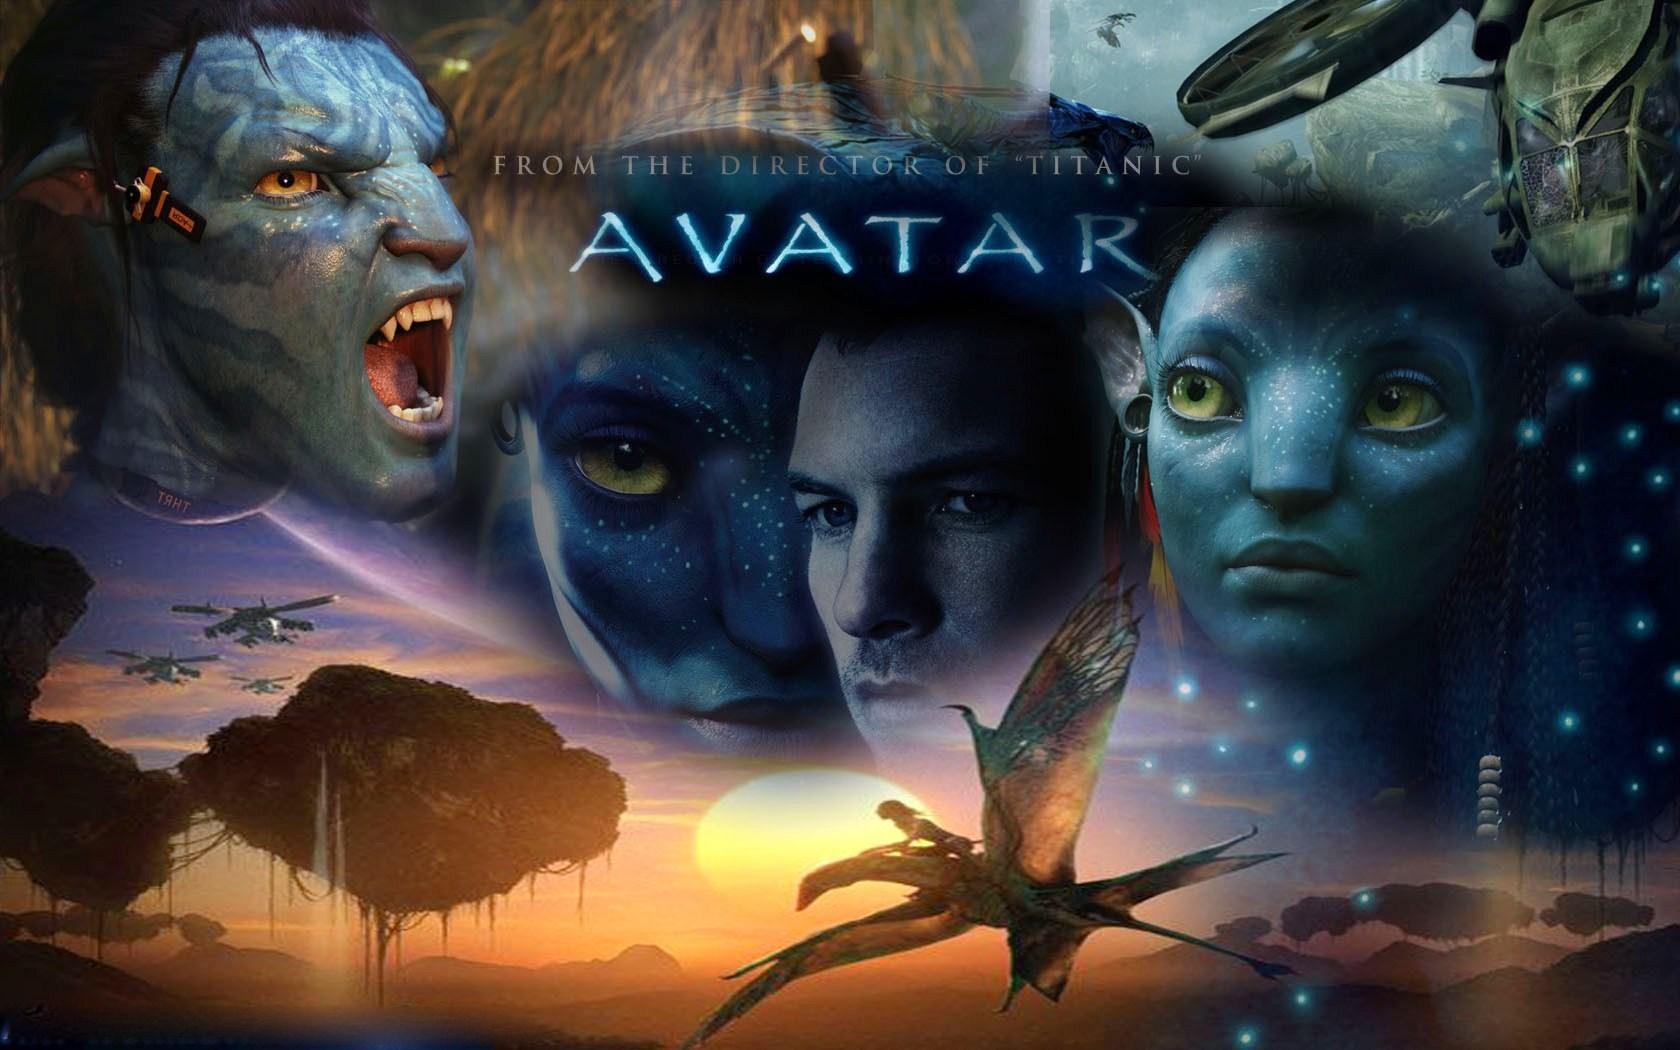 Descargar Avatar 2009 En Espanol Latino Completa Por Mega Descarga Peliculas En Full Hd Link Mega